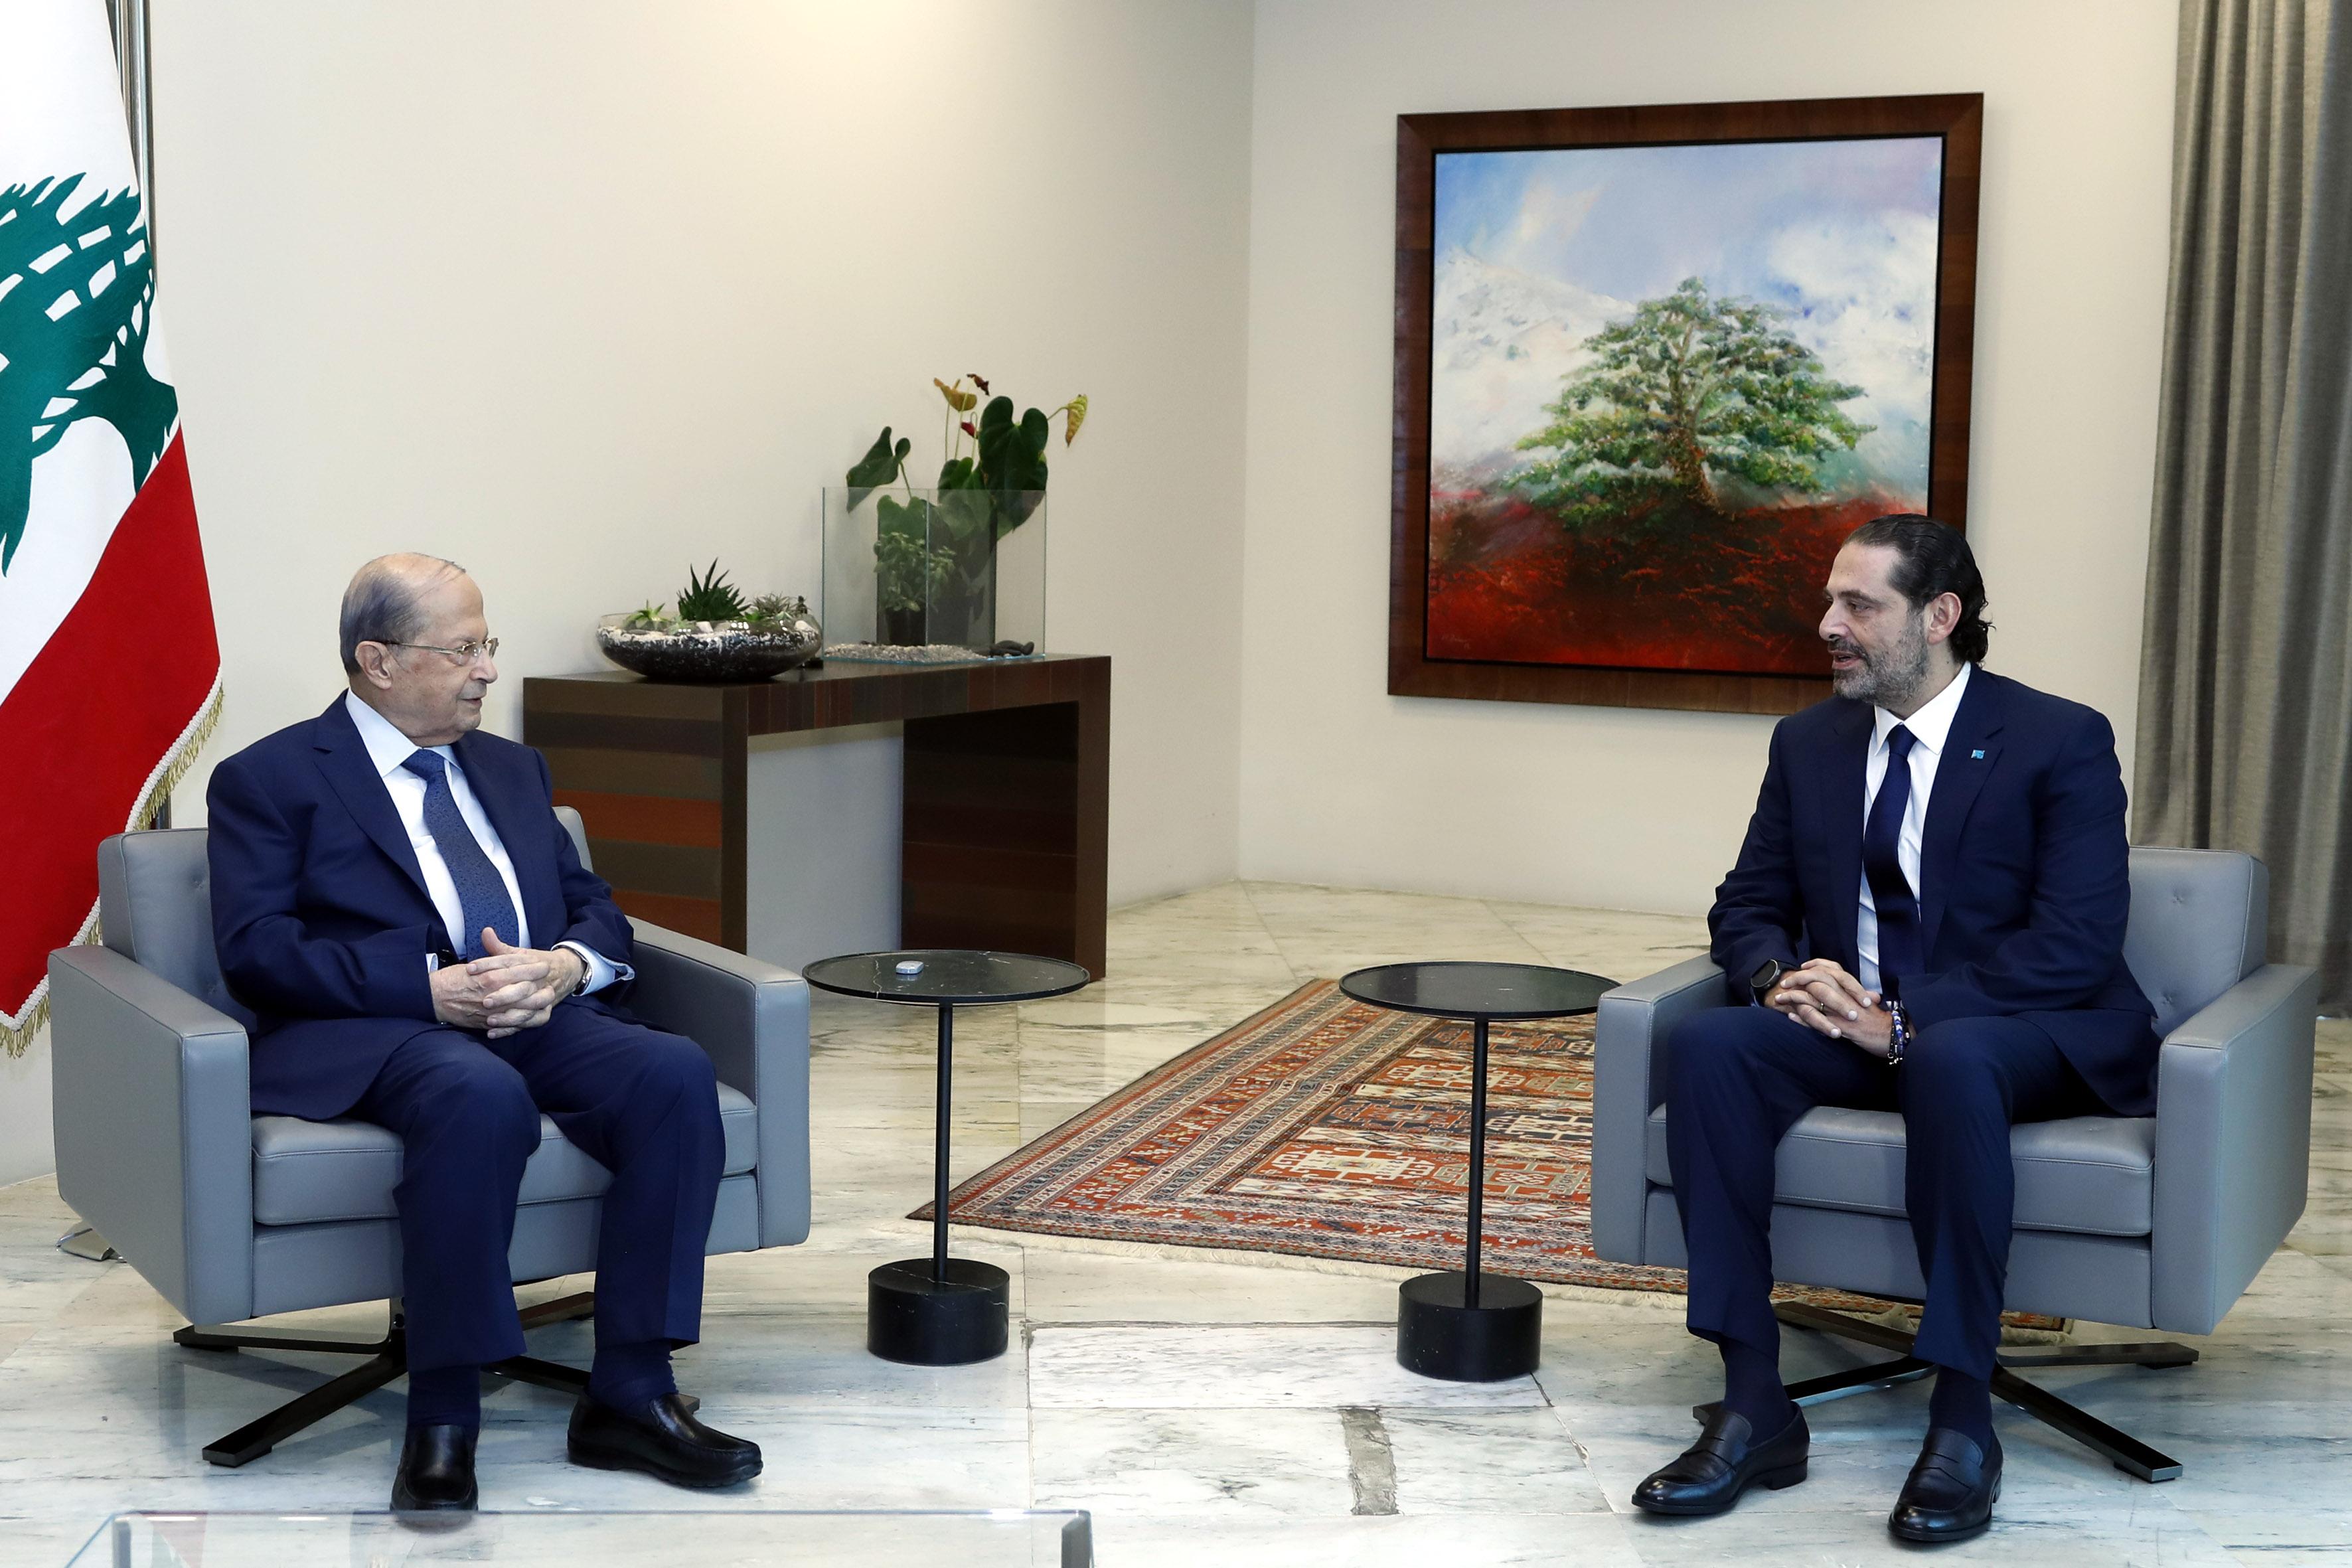 01 -President Michel Aoun meets Designated PM Saad Hariri. PM Saad Hariri 1